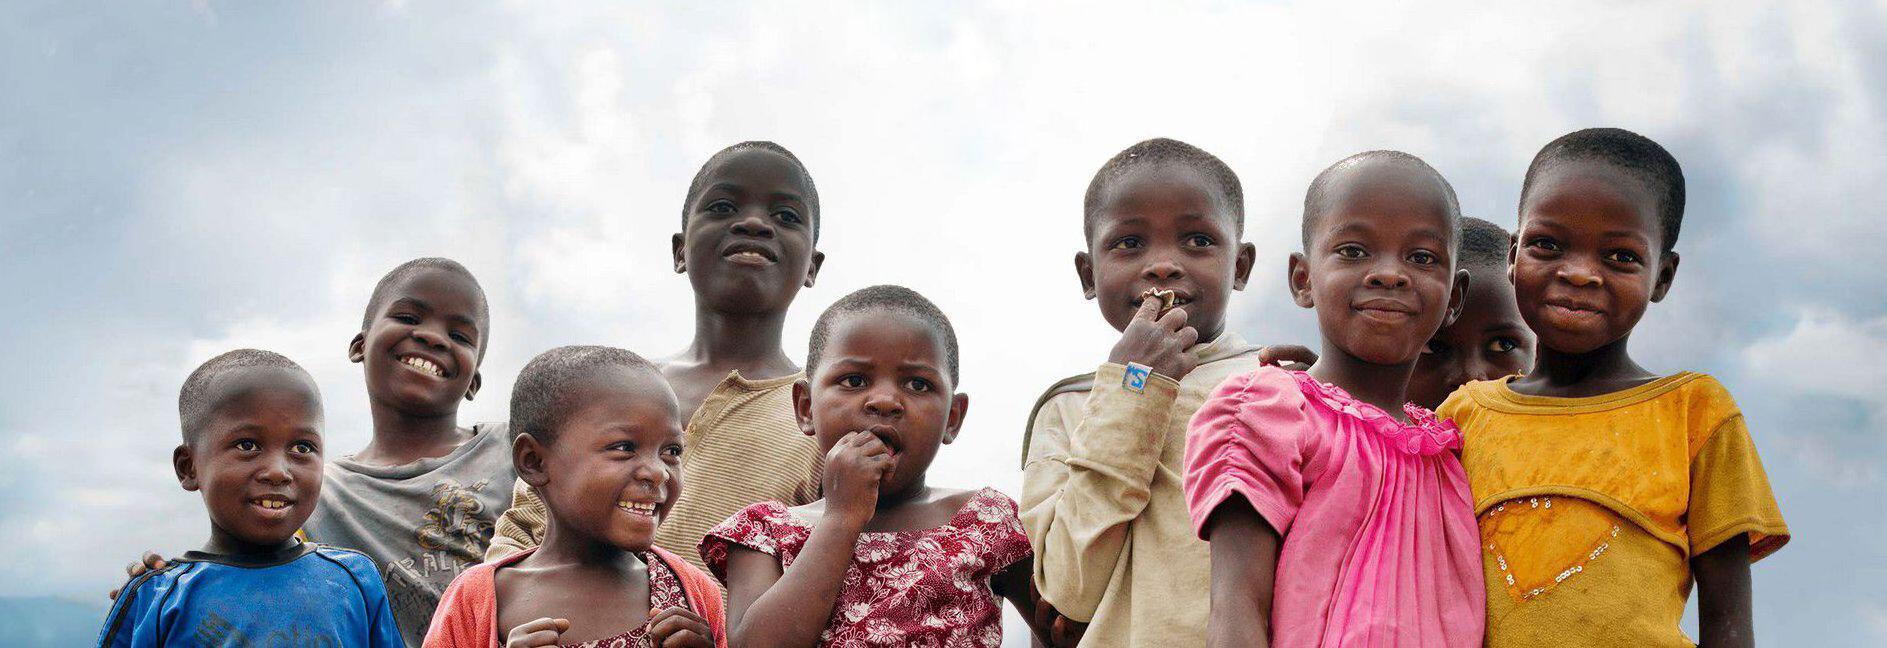 Bild zu United Internet for UNICEF, Ostern